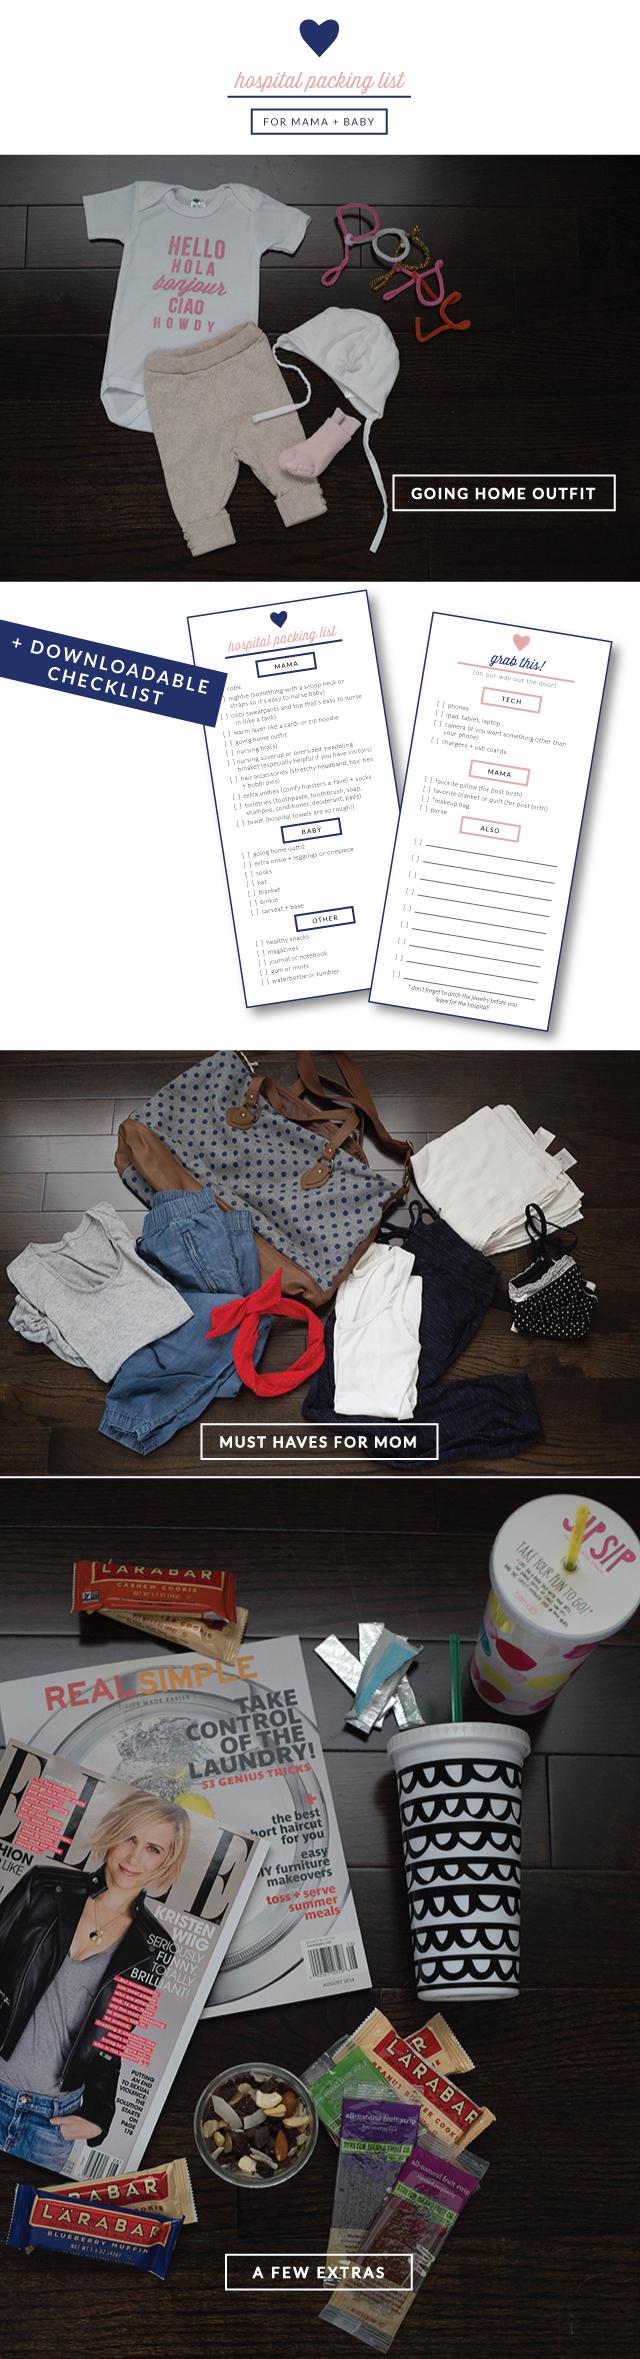 hospital-bag-packing-list